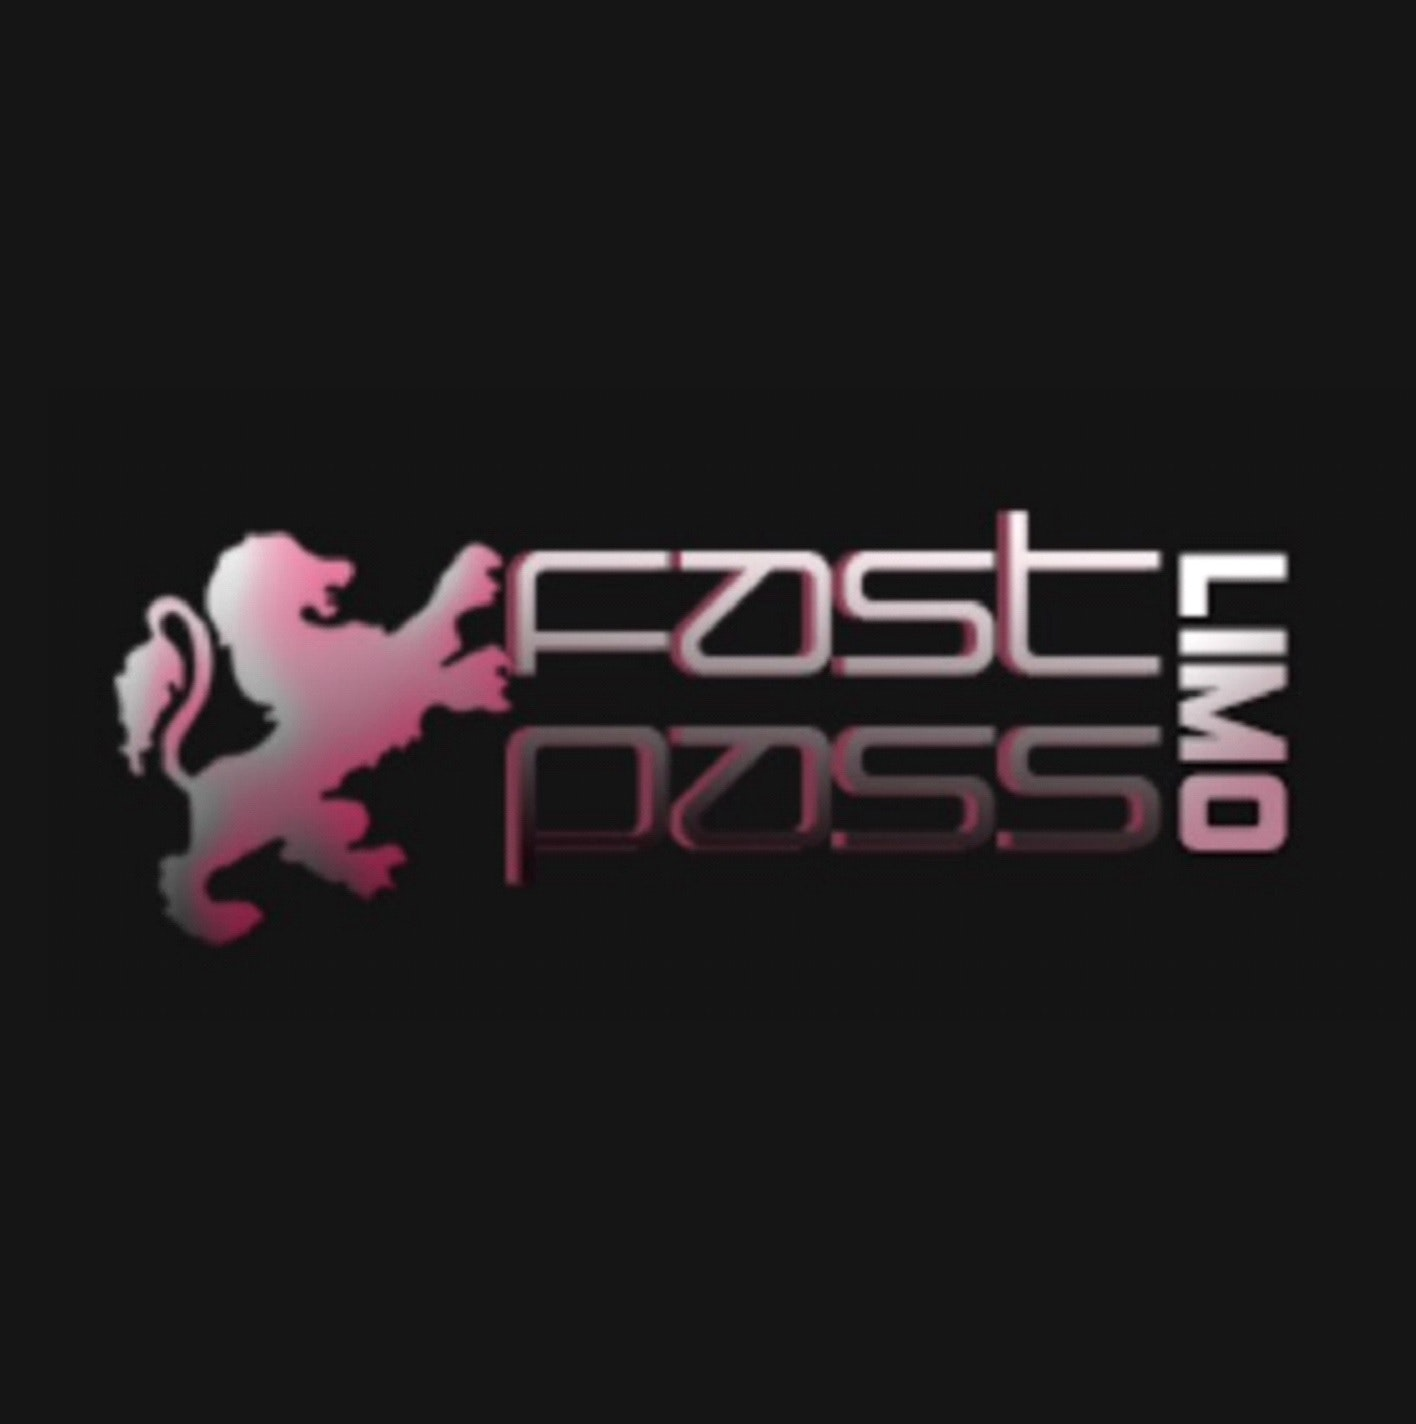 Fast Pass Limo logo